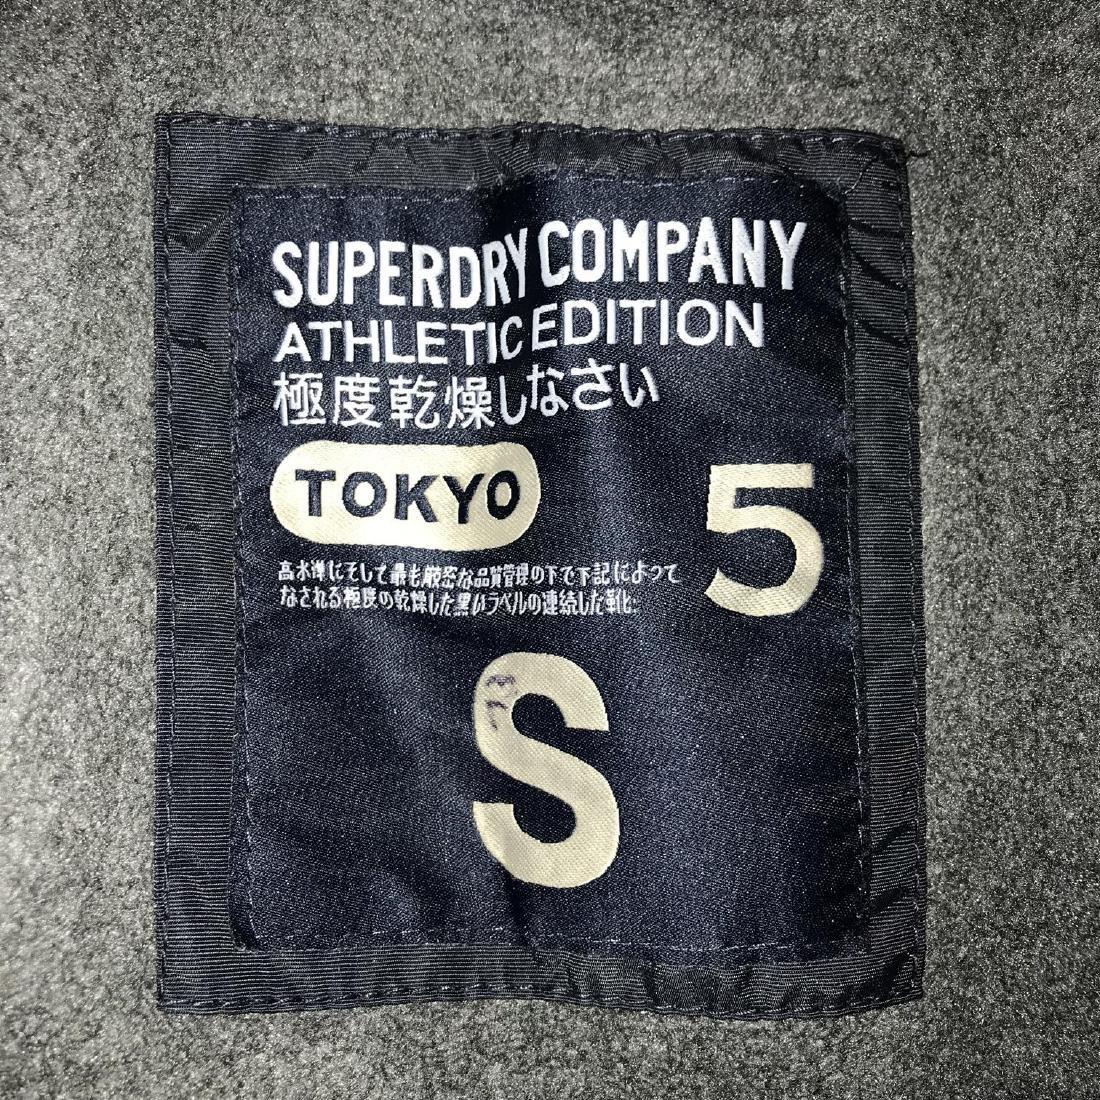 Men's Superdry TOKYO 5 Navy Blue Jacket Size S Perfect! - 3